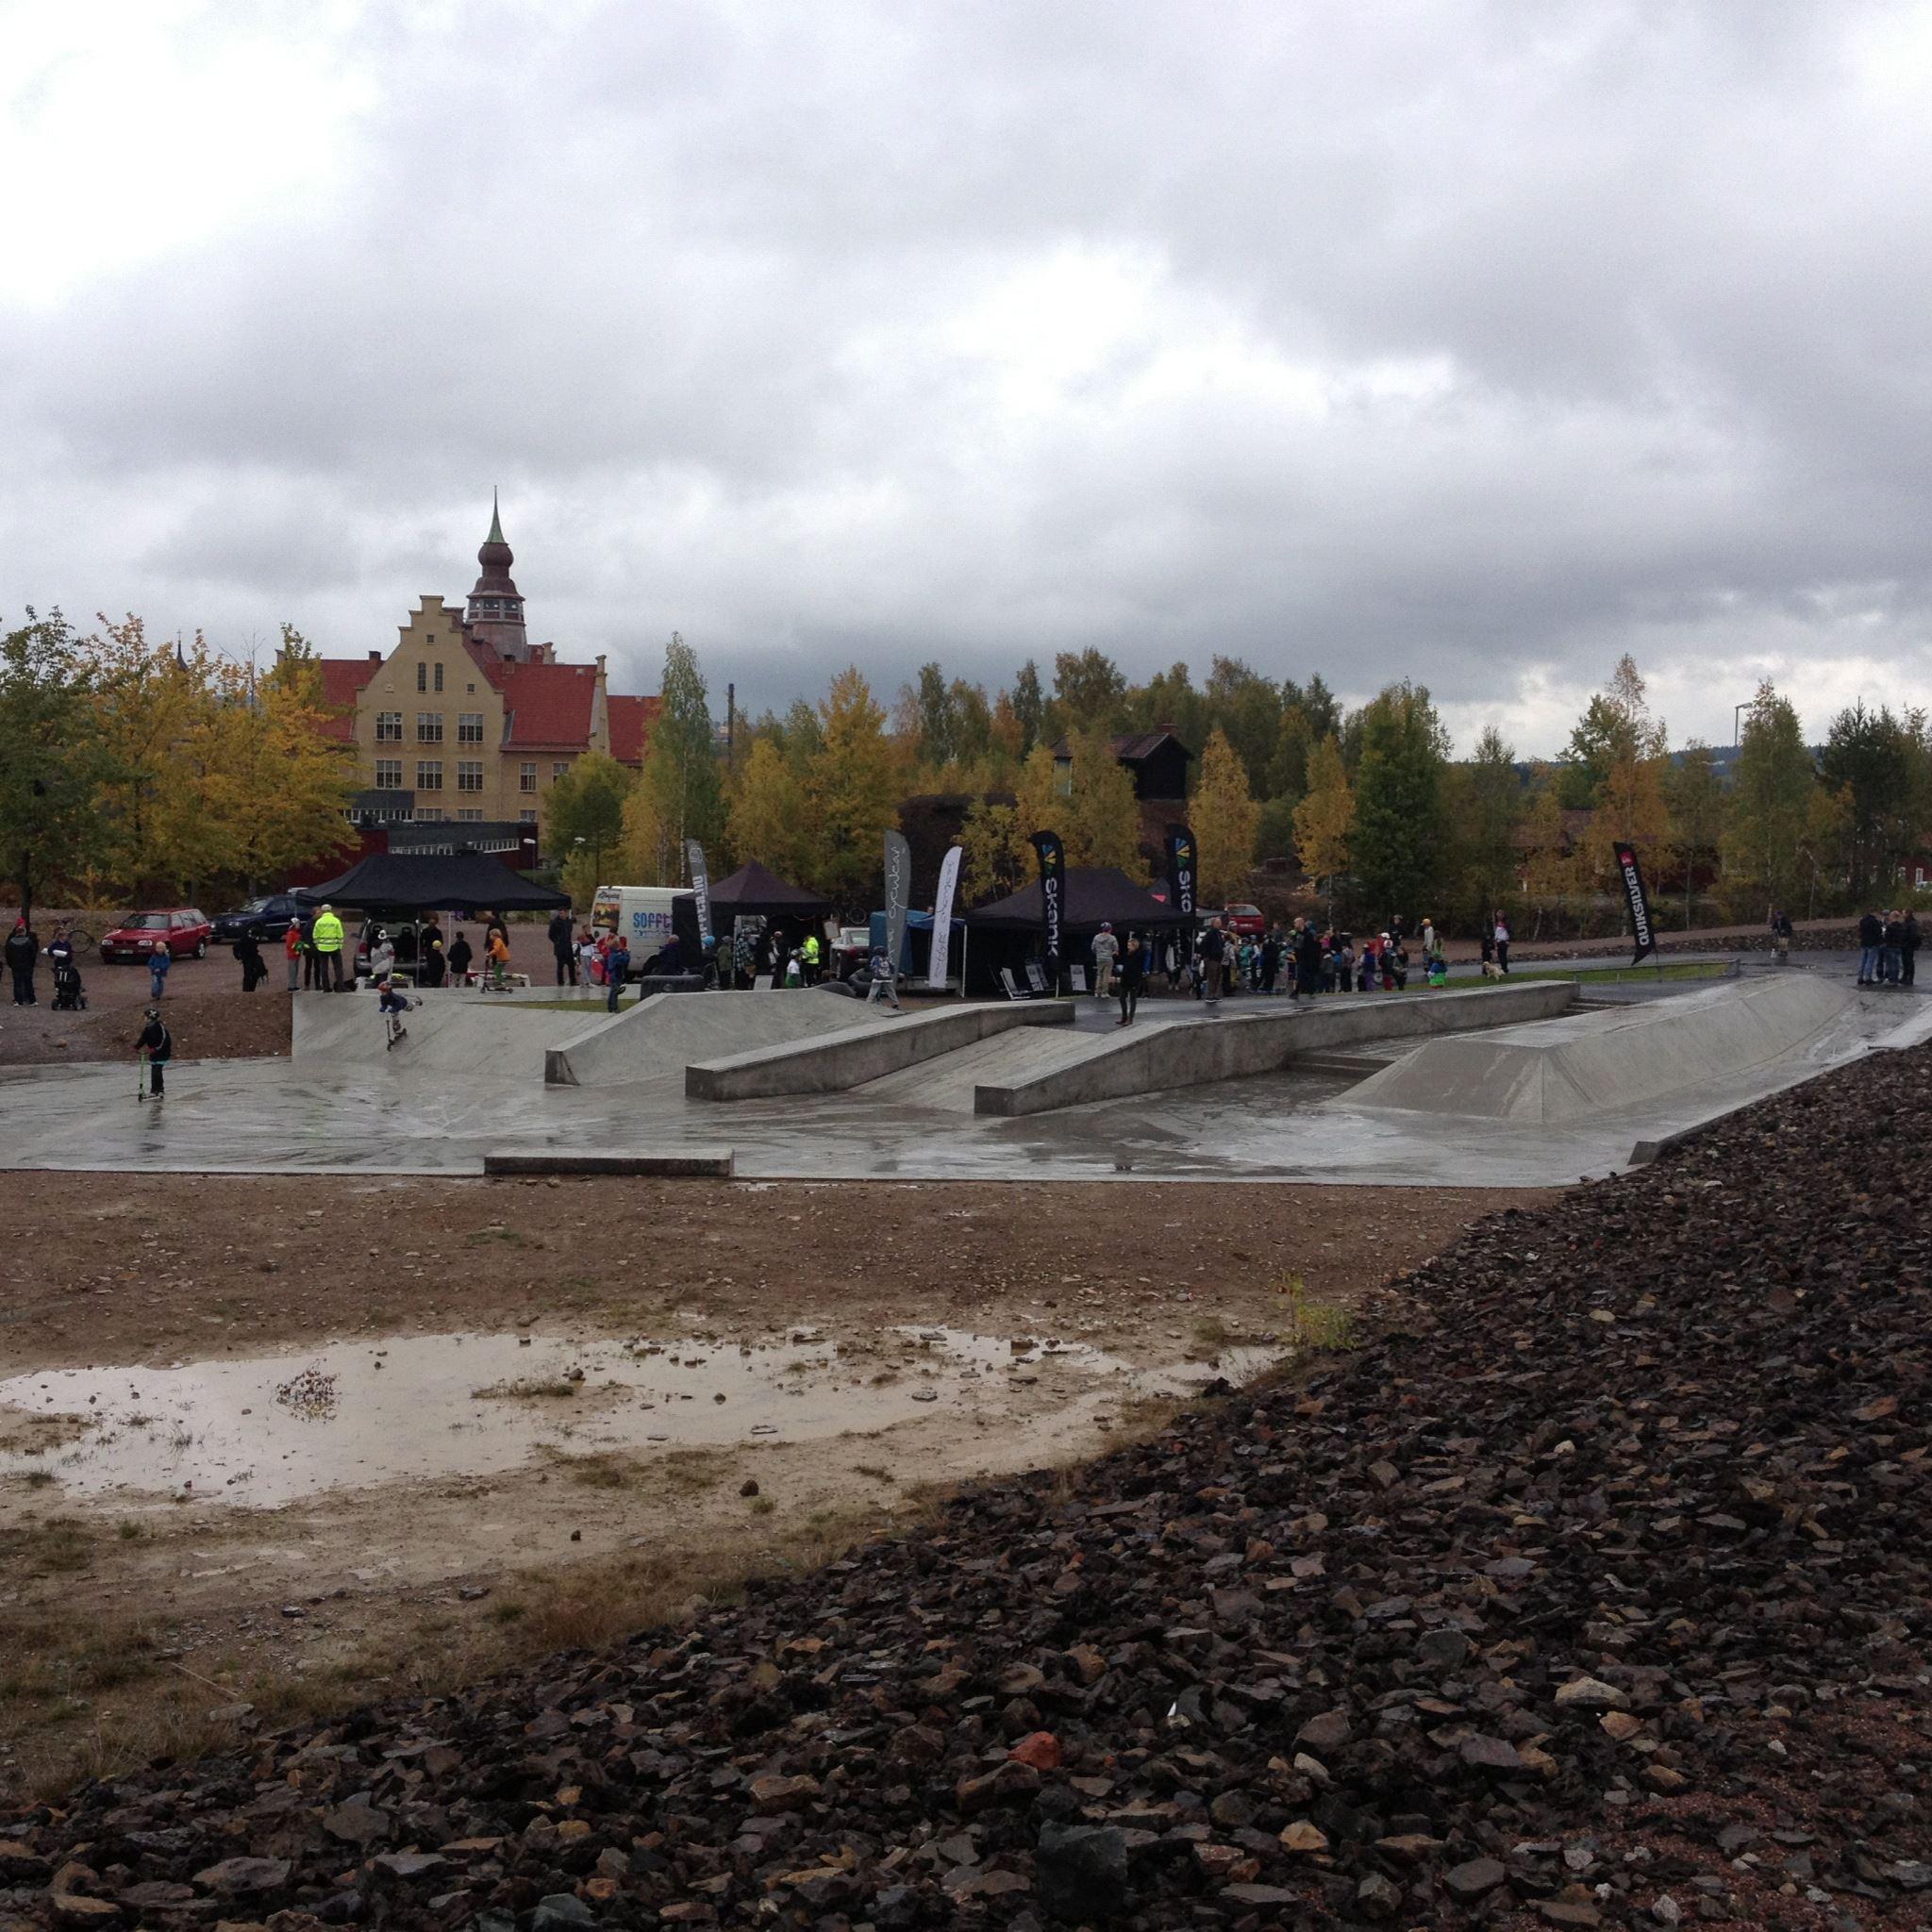 Hyttgårdsparken - Skatepark